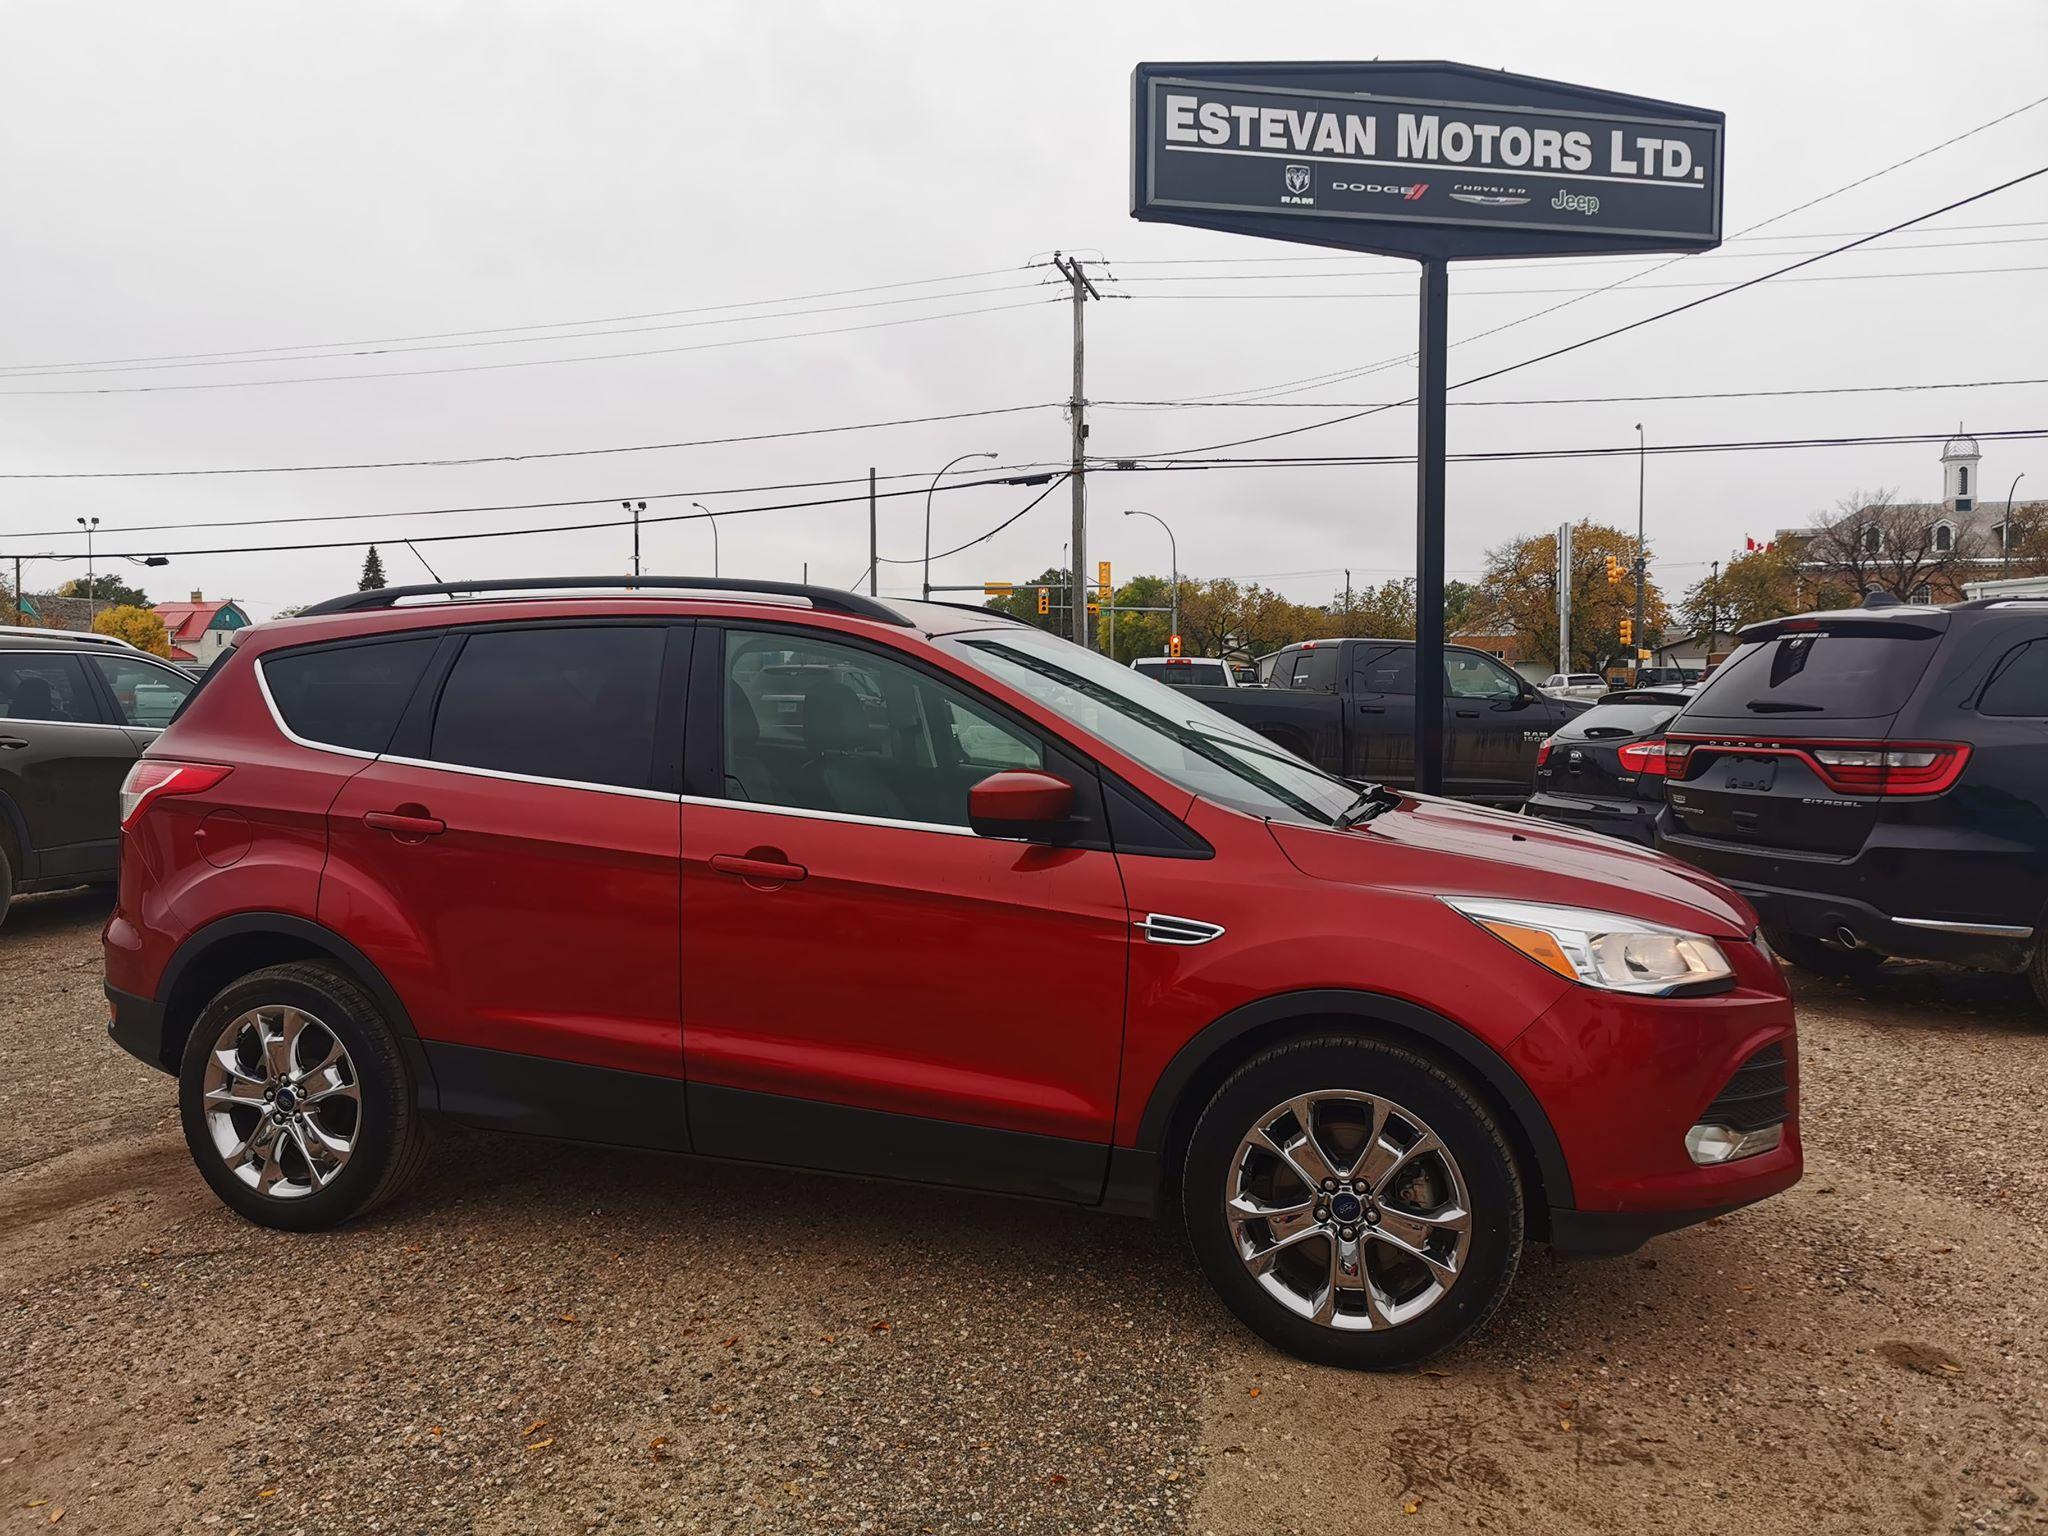 Featured used 2014 Ford Escape SE SUV for sale in Estevan, Saskatchewan